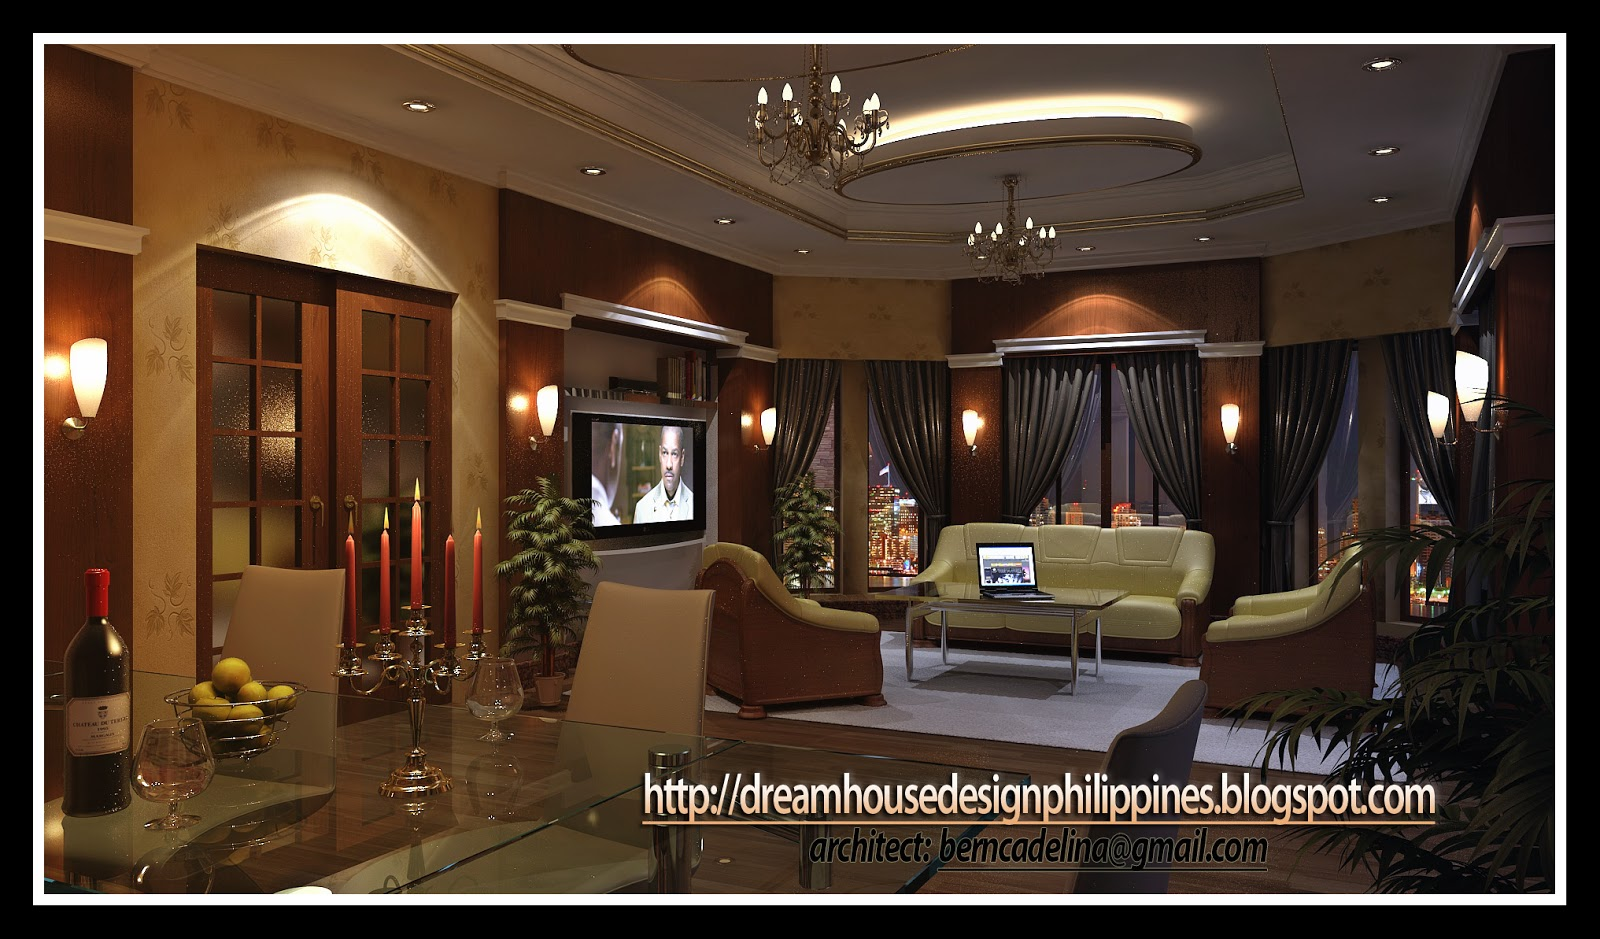 Philippine dream house design may 2011 for Interior design philippines